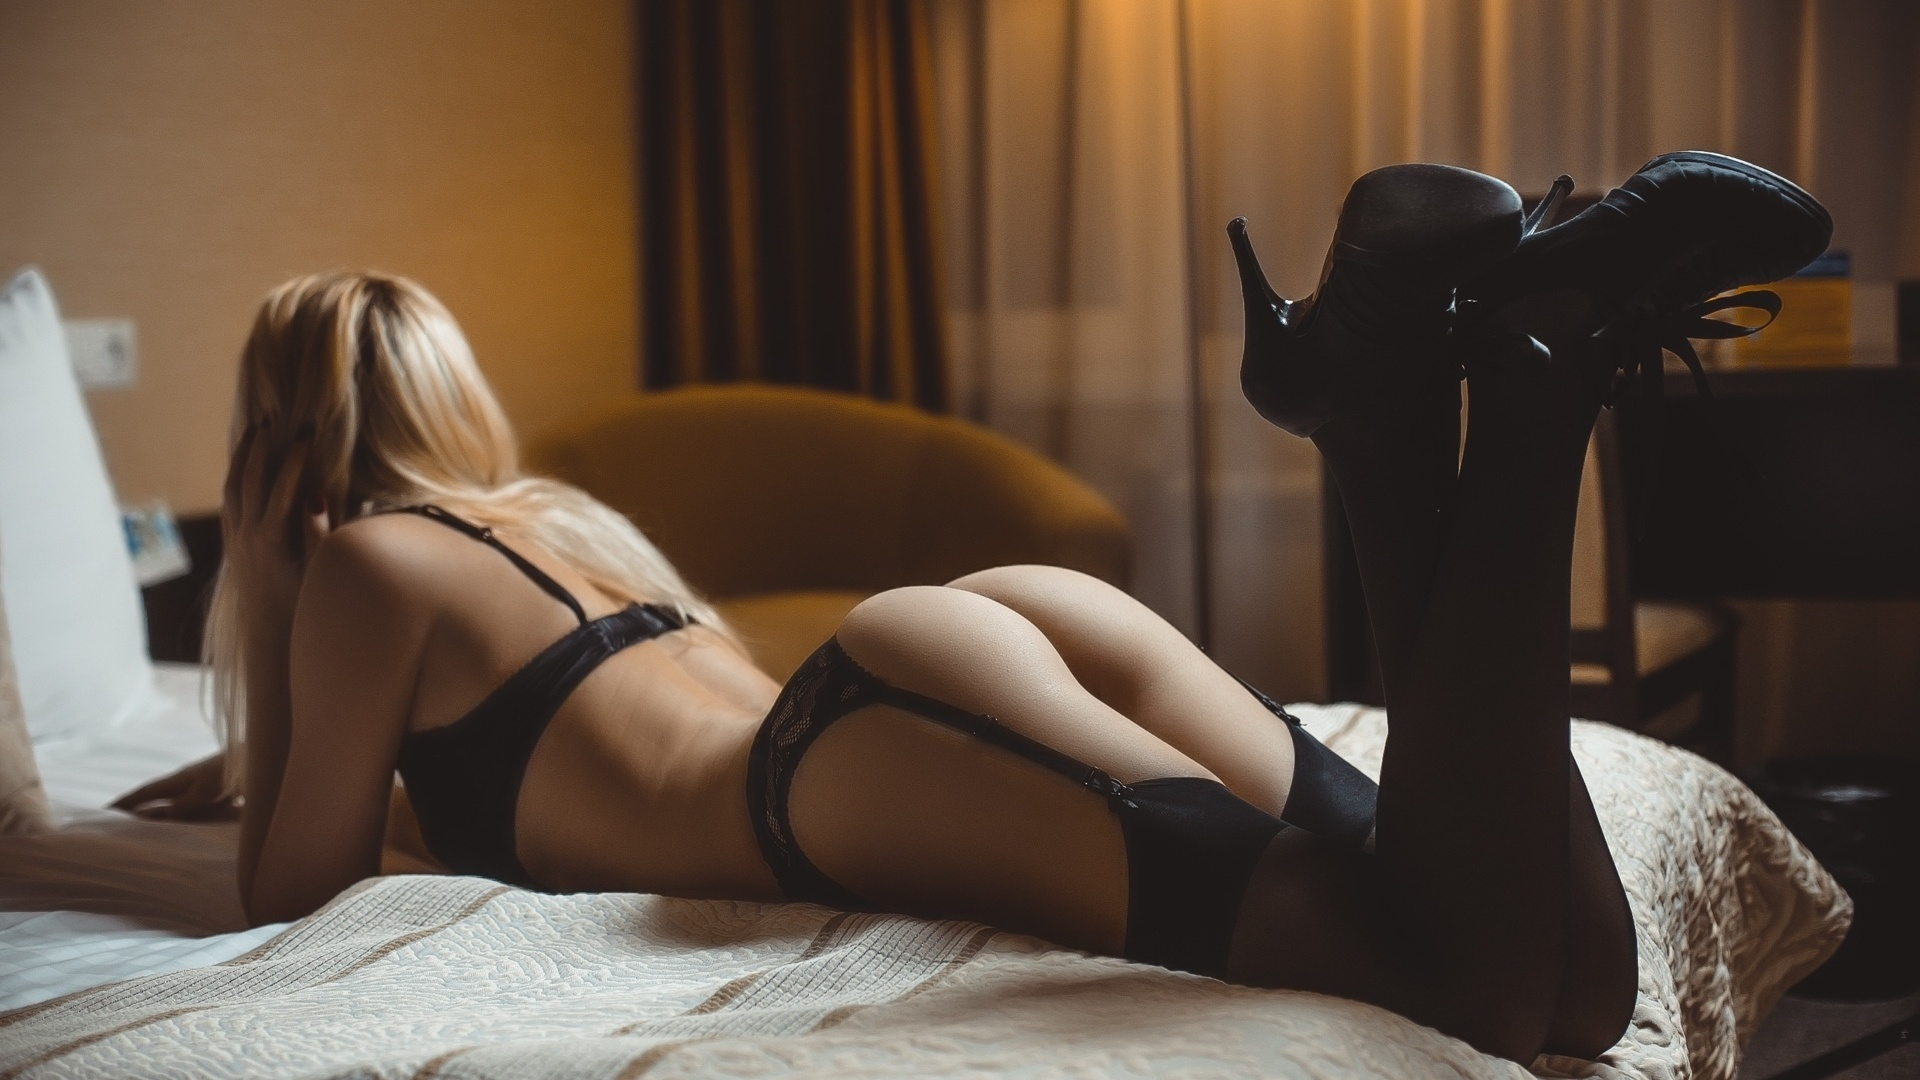 Black stockings escort